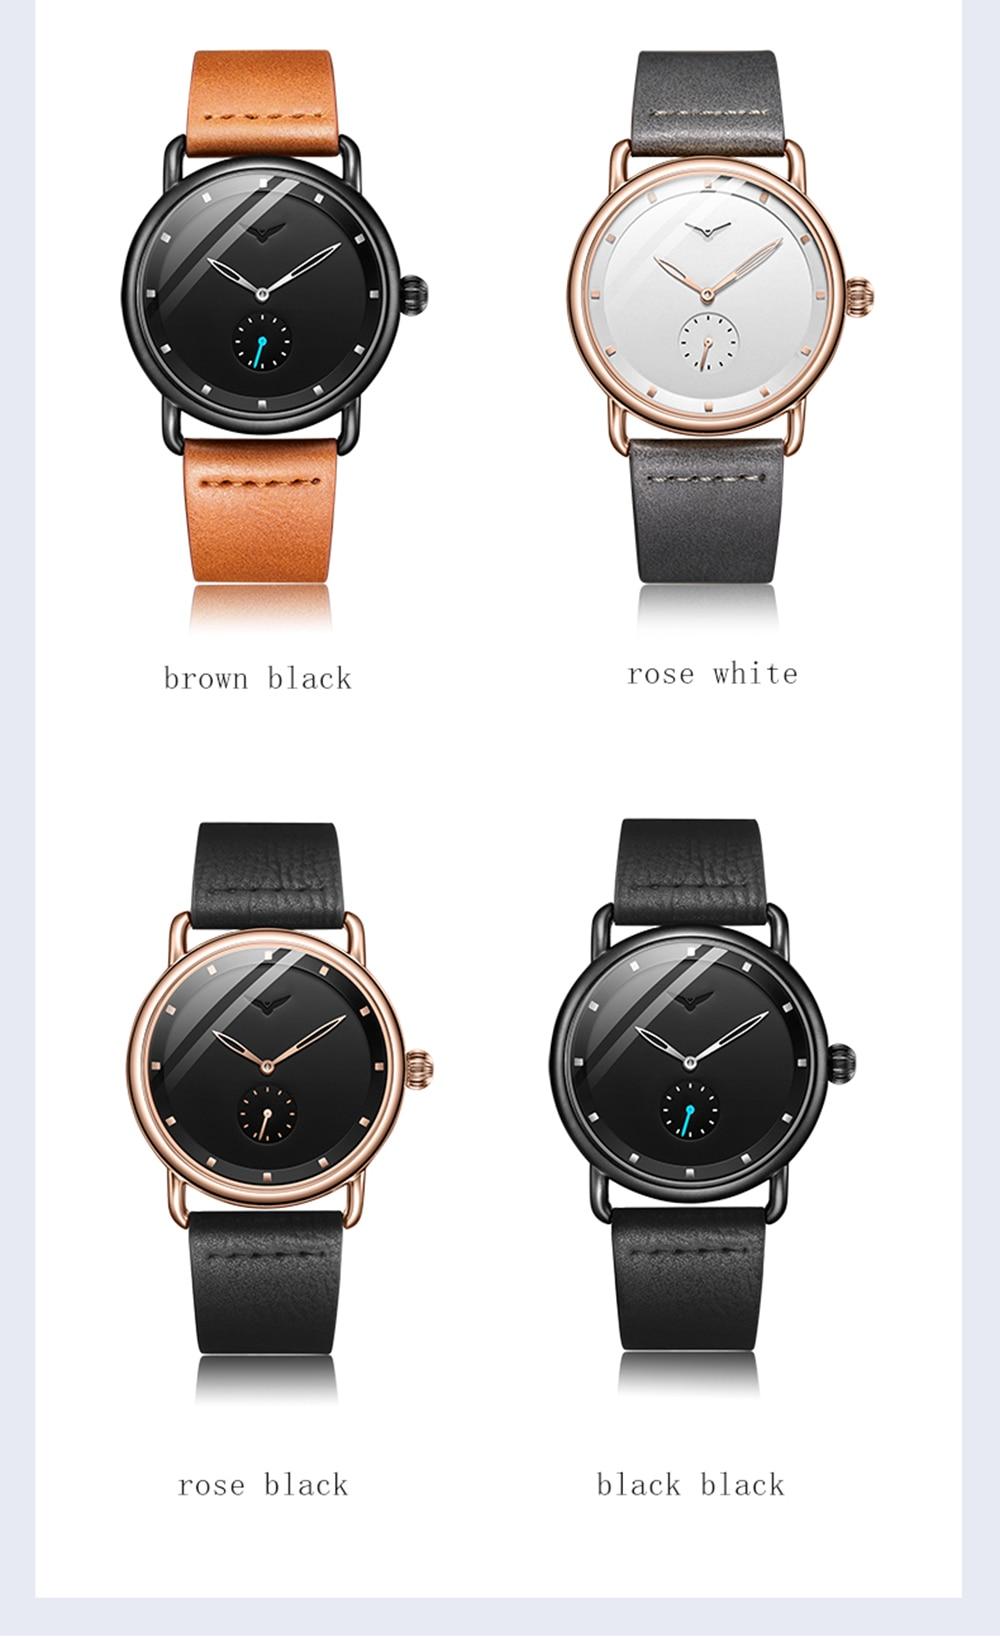 Hd4802c066ff94b9a895ebf9002a82e29r ONOLA top brand leather men watches clock fashion sport simple casual waterproof Wrist watch men relogio masculino